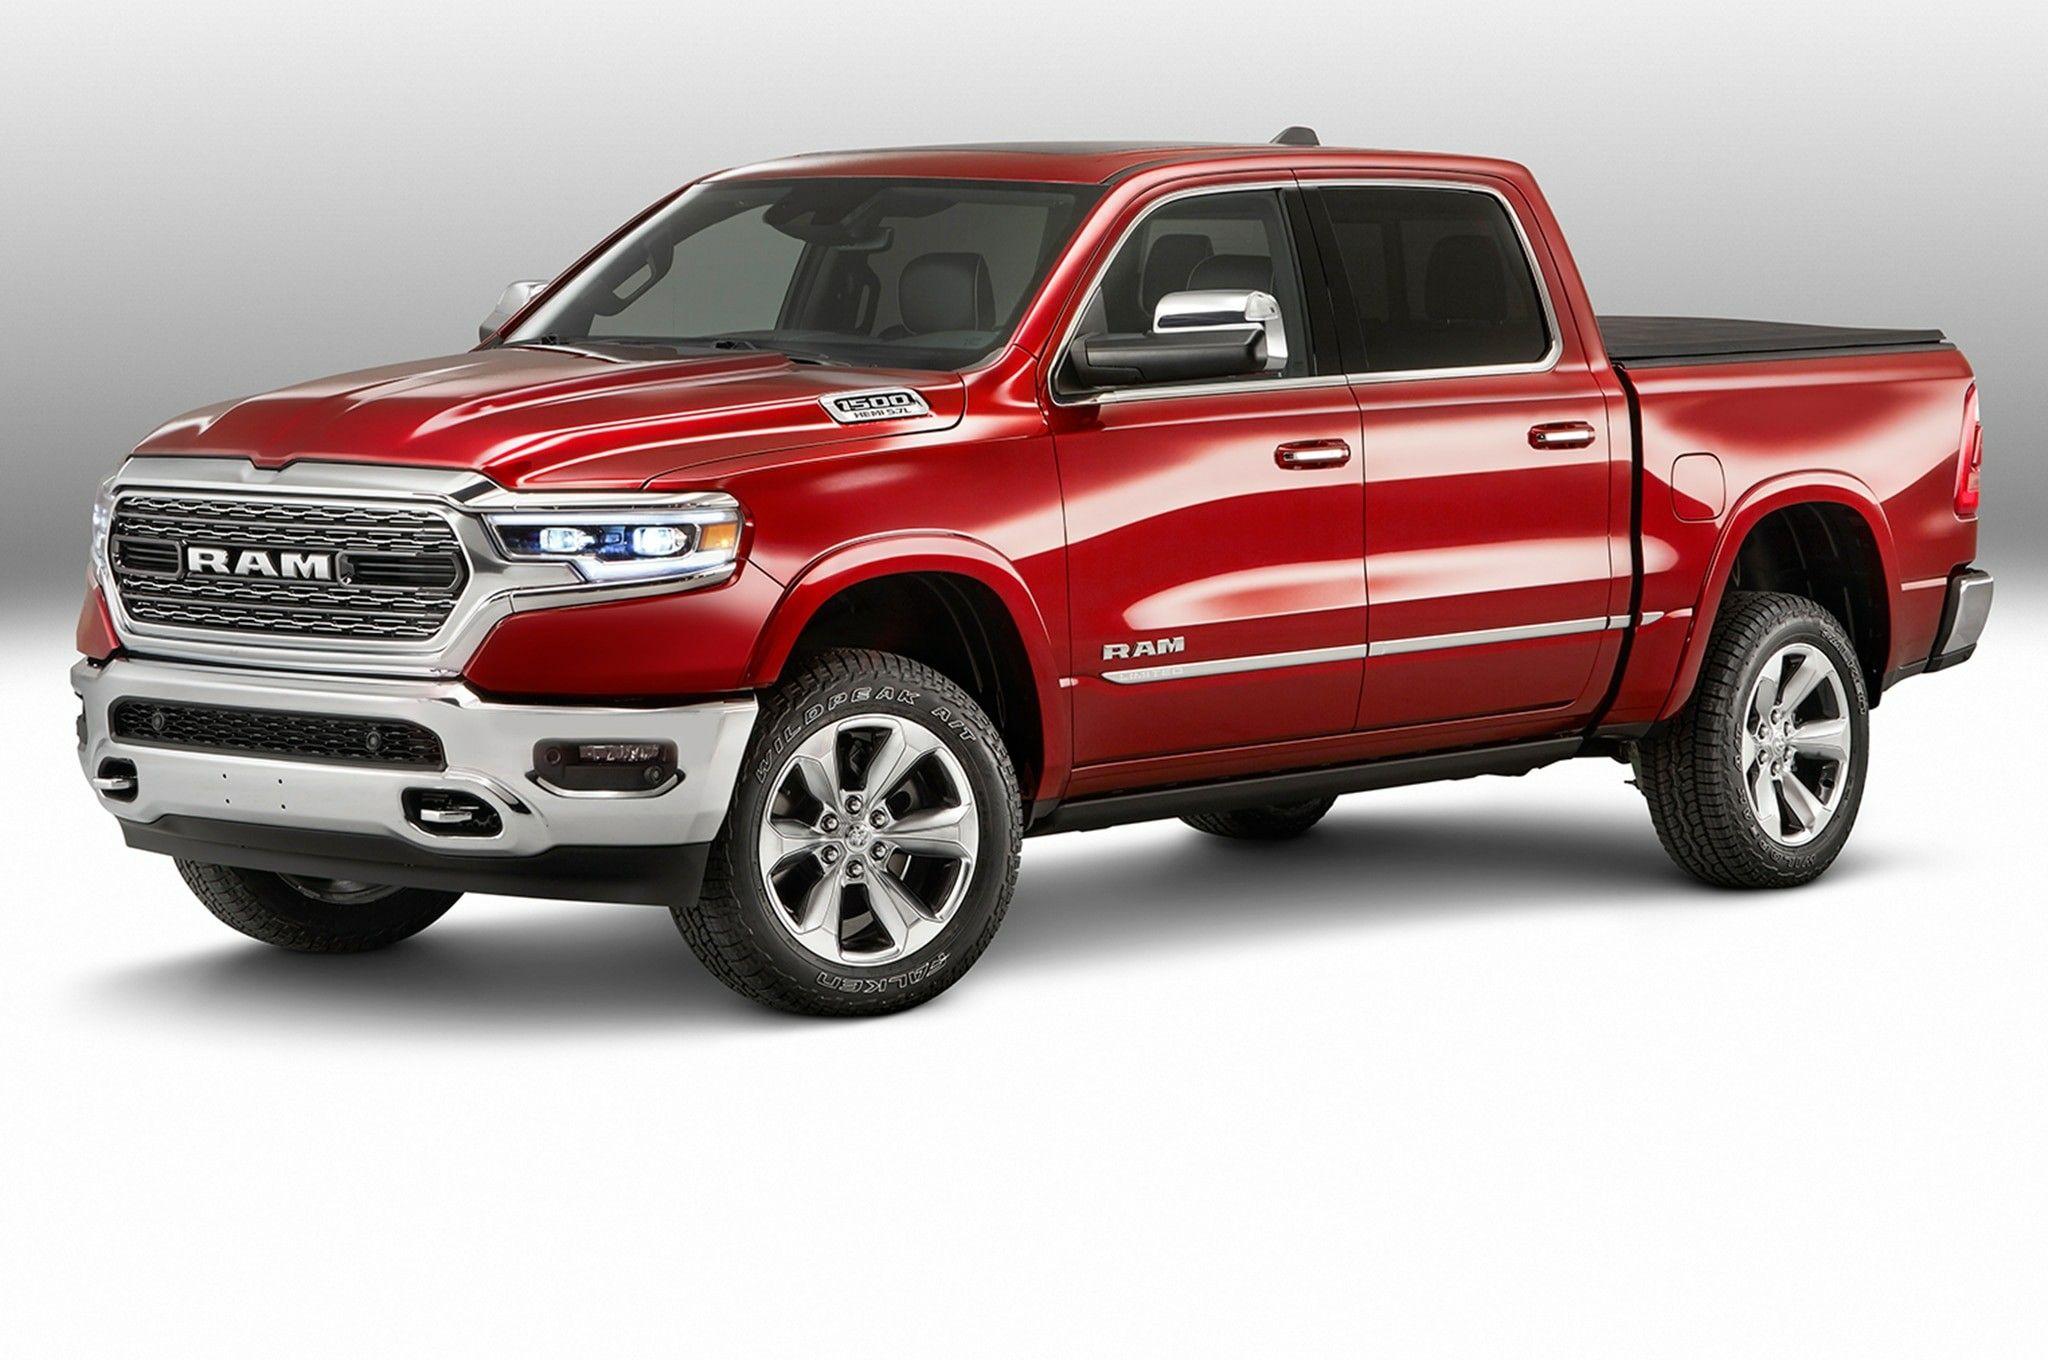 2019 Dodge Ram 1500 Limited Pick Up S Pinterest Ram Trucks